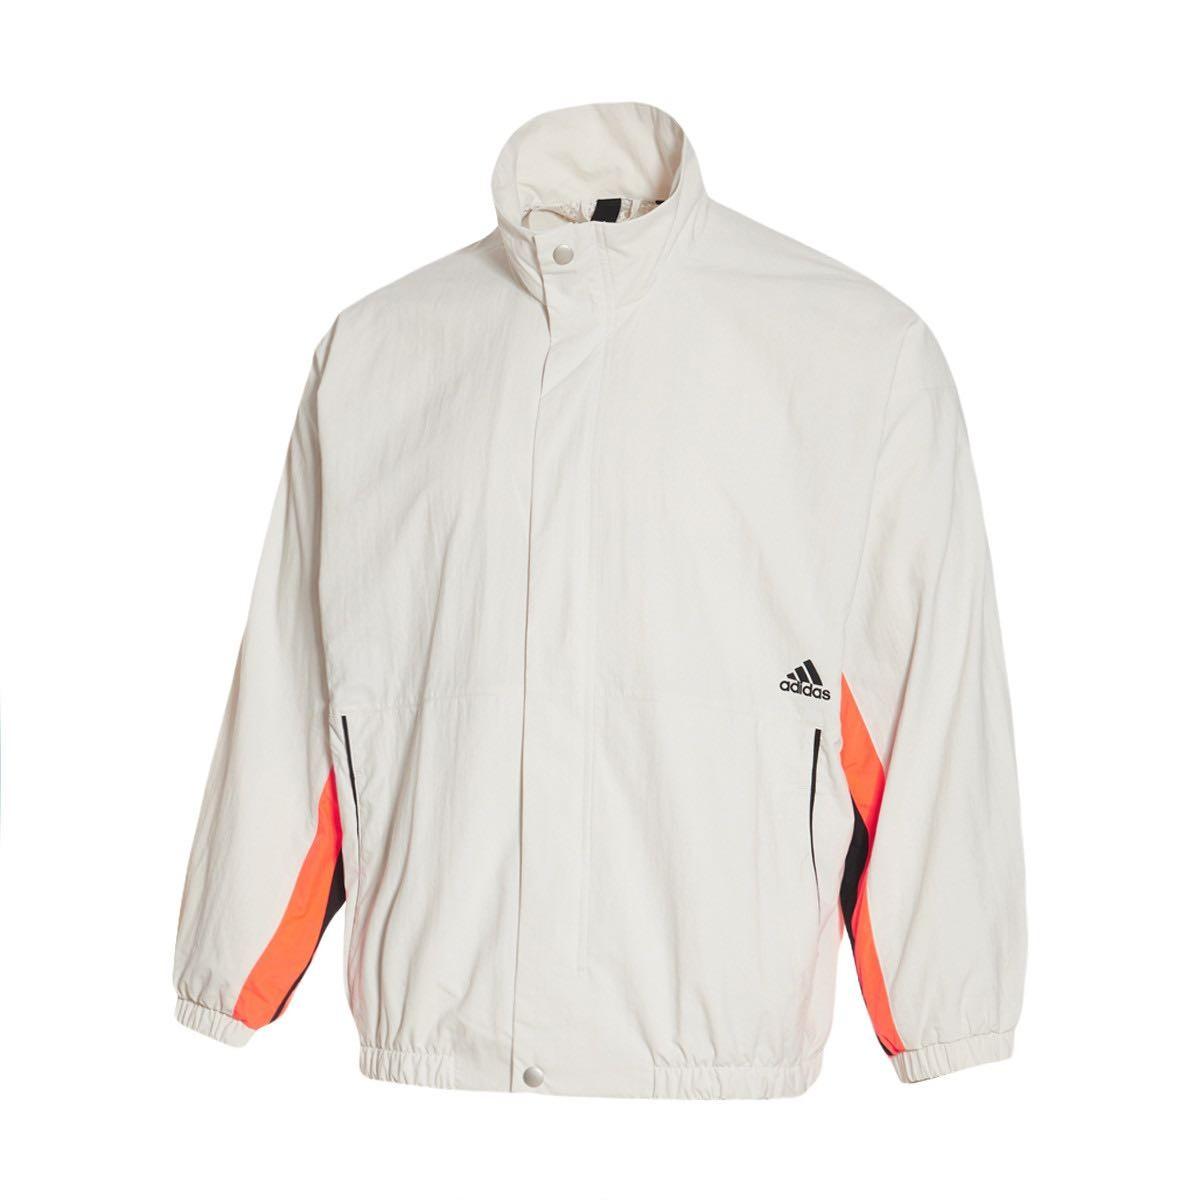 adidas 阿迪达斯 FN5672 男款夹克保暖外套 米白色 L